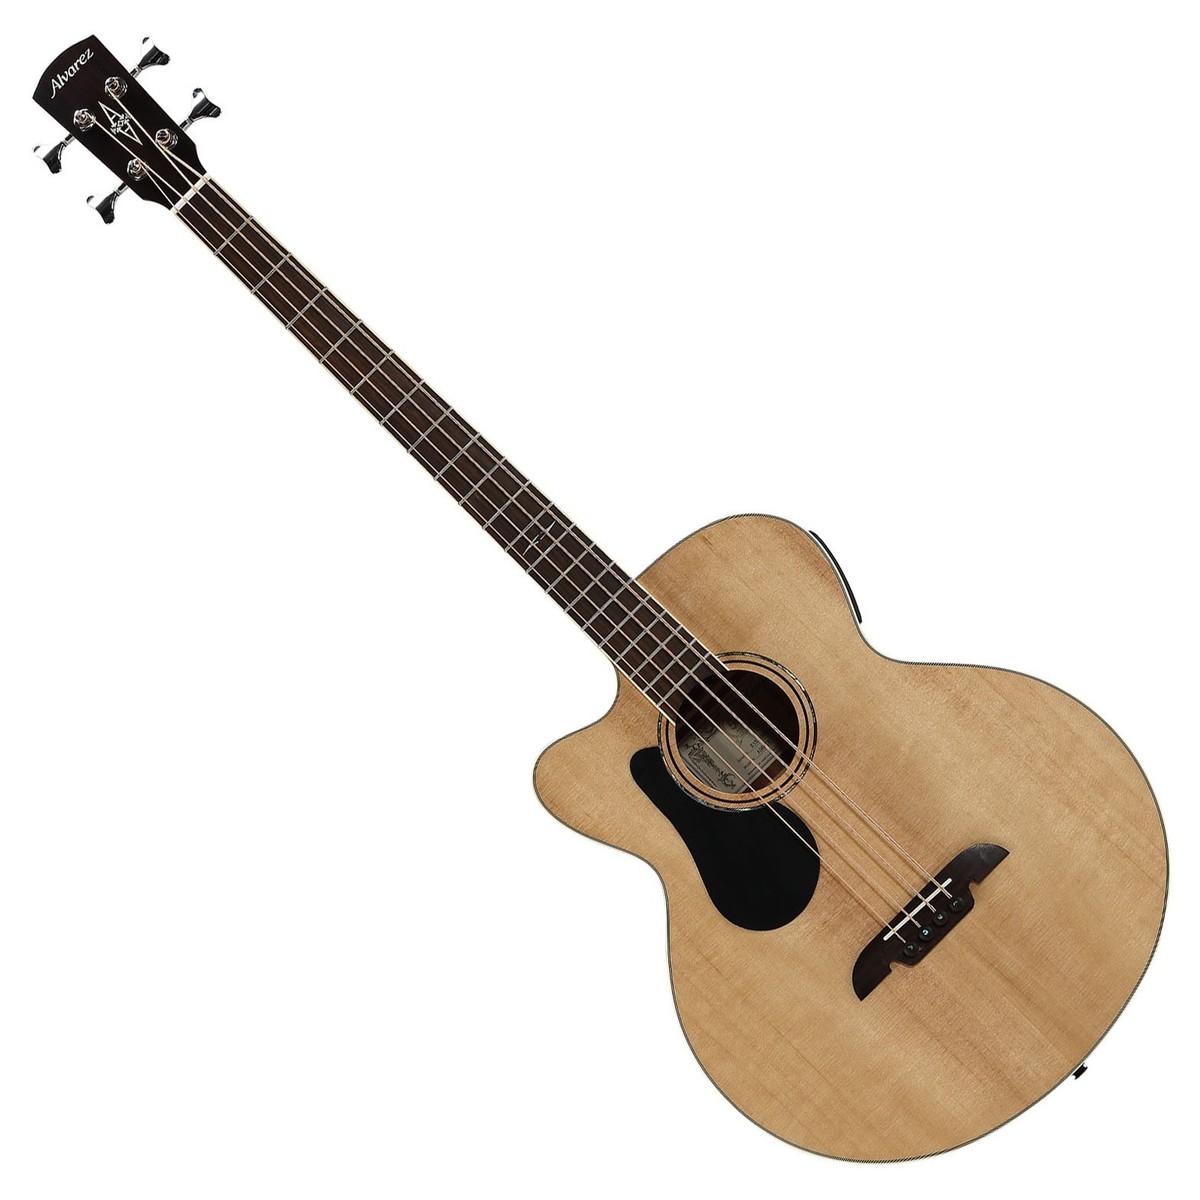 alvarez ab60lce left handed electro acoustic bass guitar 2016 at. Black Bedroom Furniture Sets. Home Design Ideas